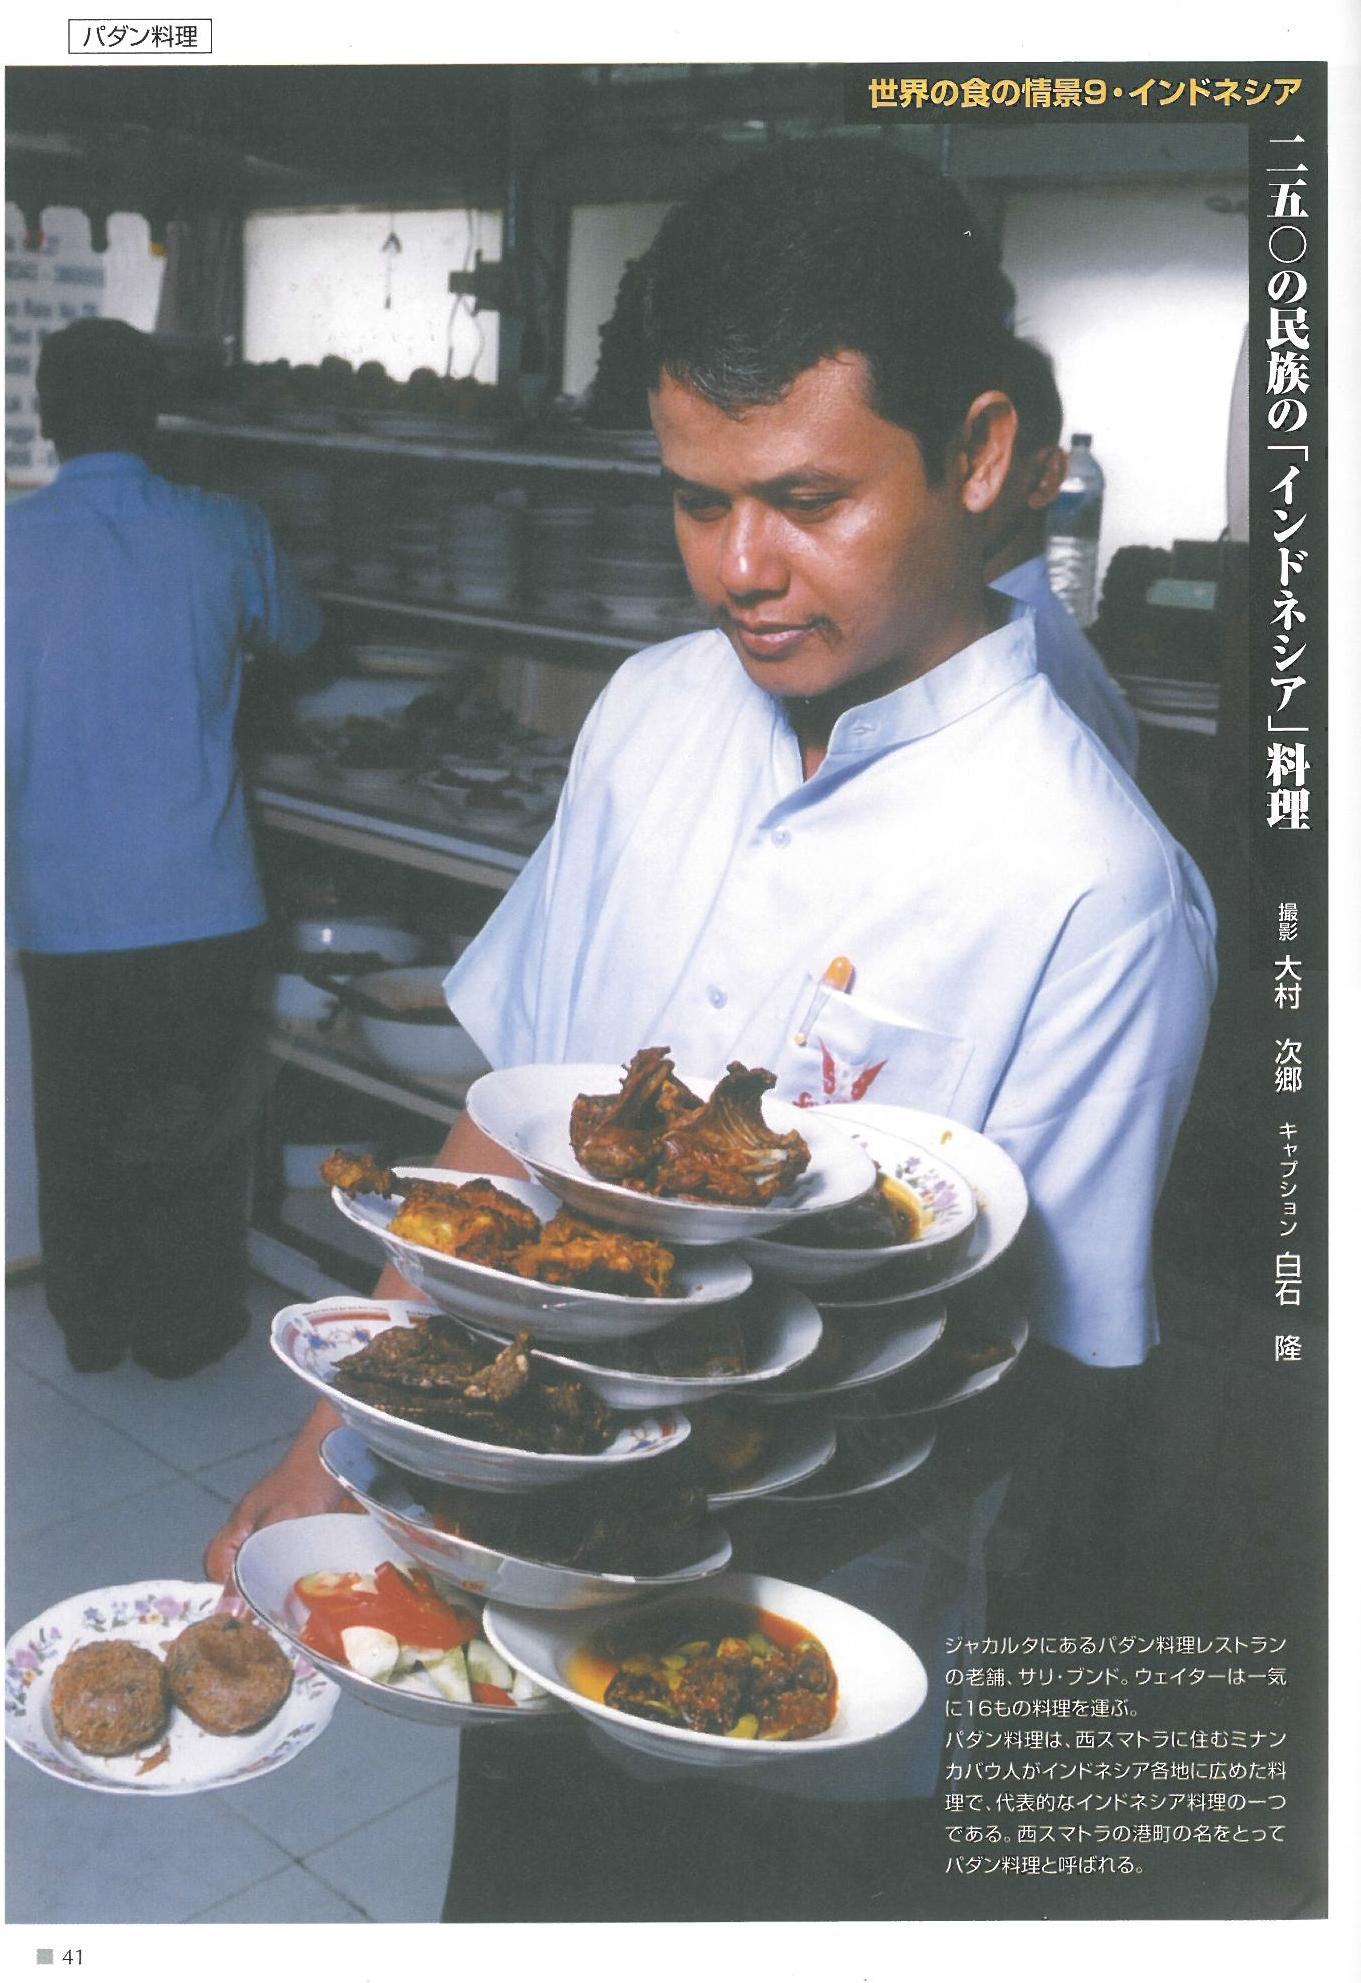 Penjual Masakan Padang